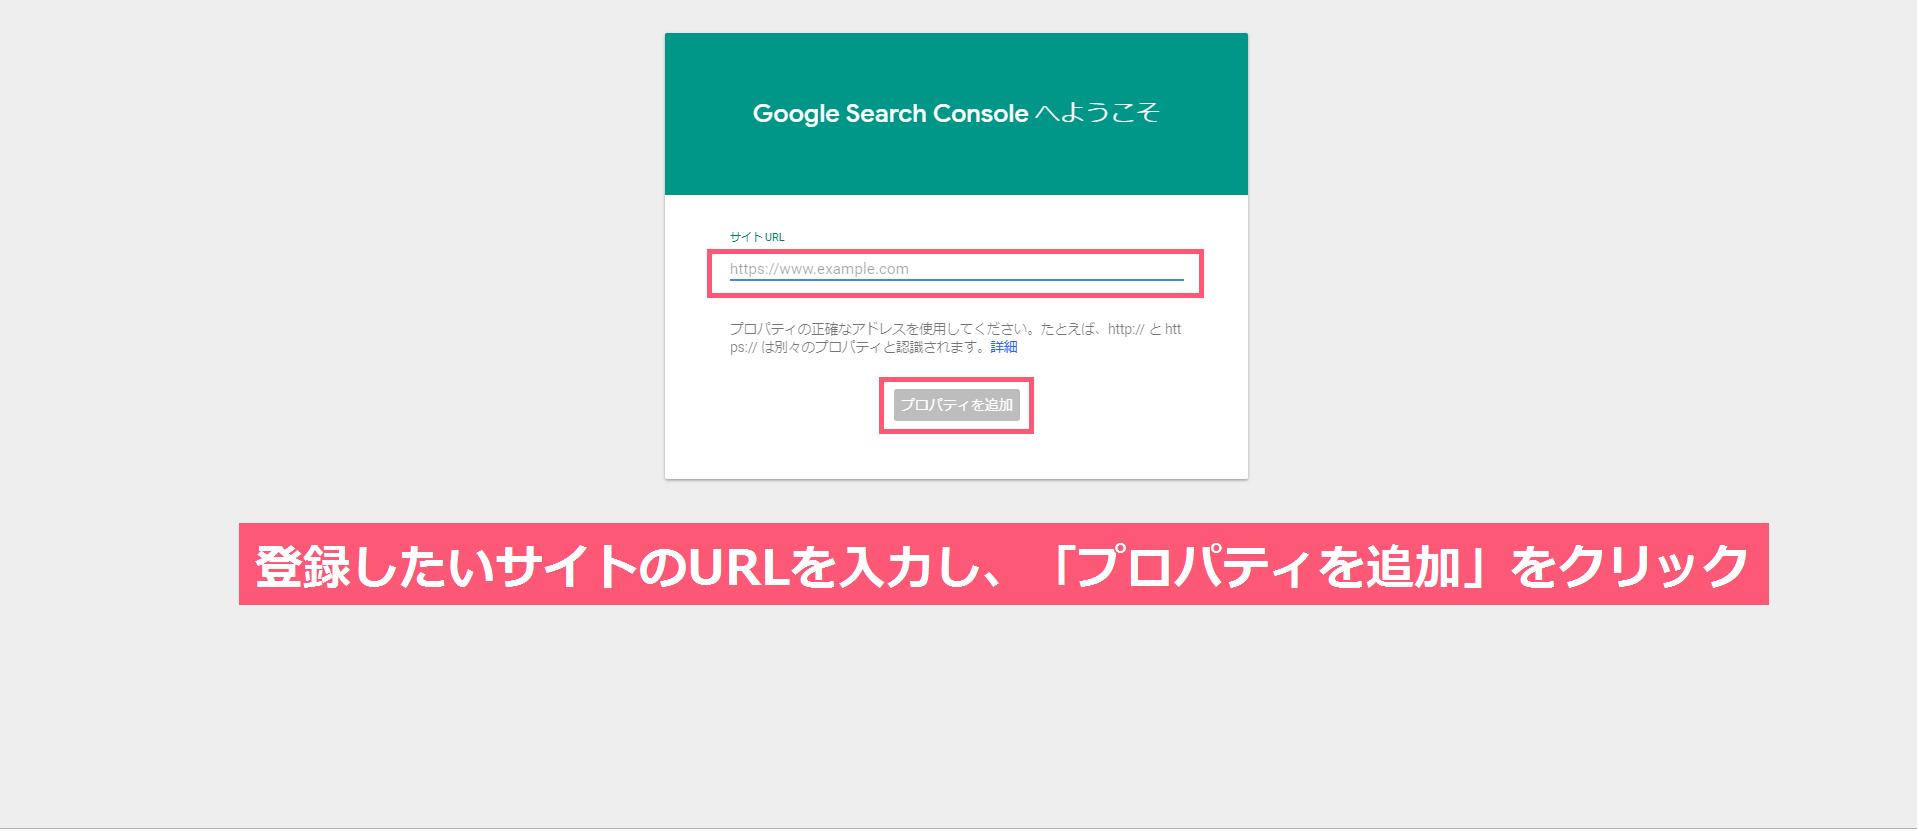 Google Search Consoleの登録画面①